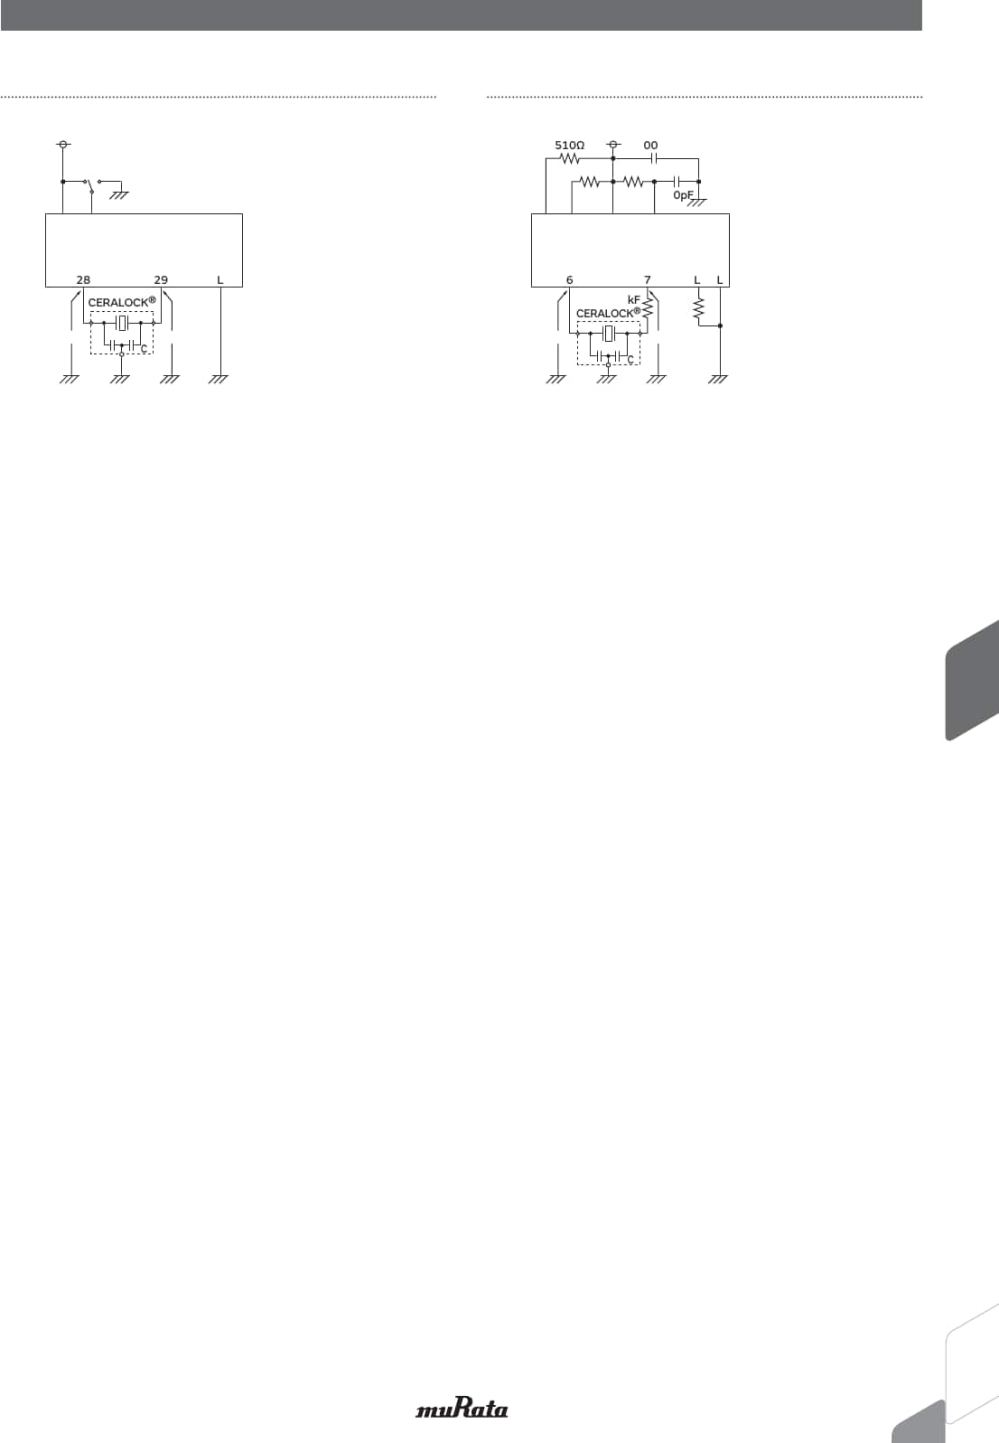 medium resolution of application circuits utilization